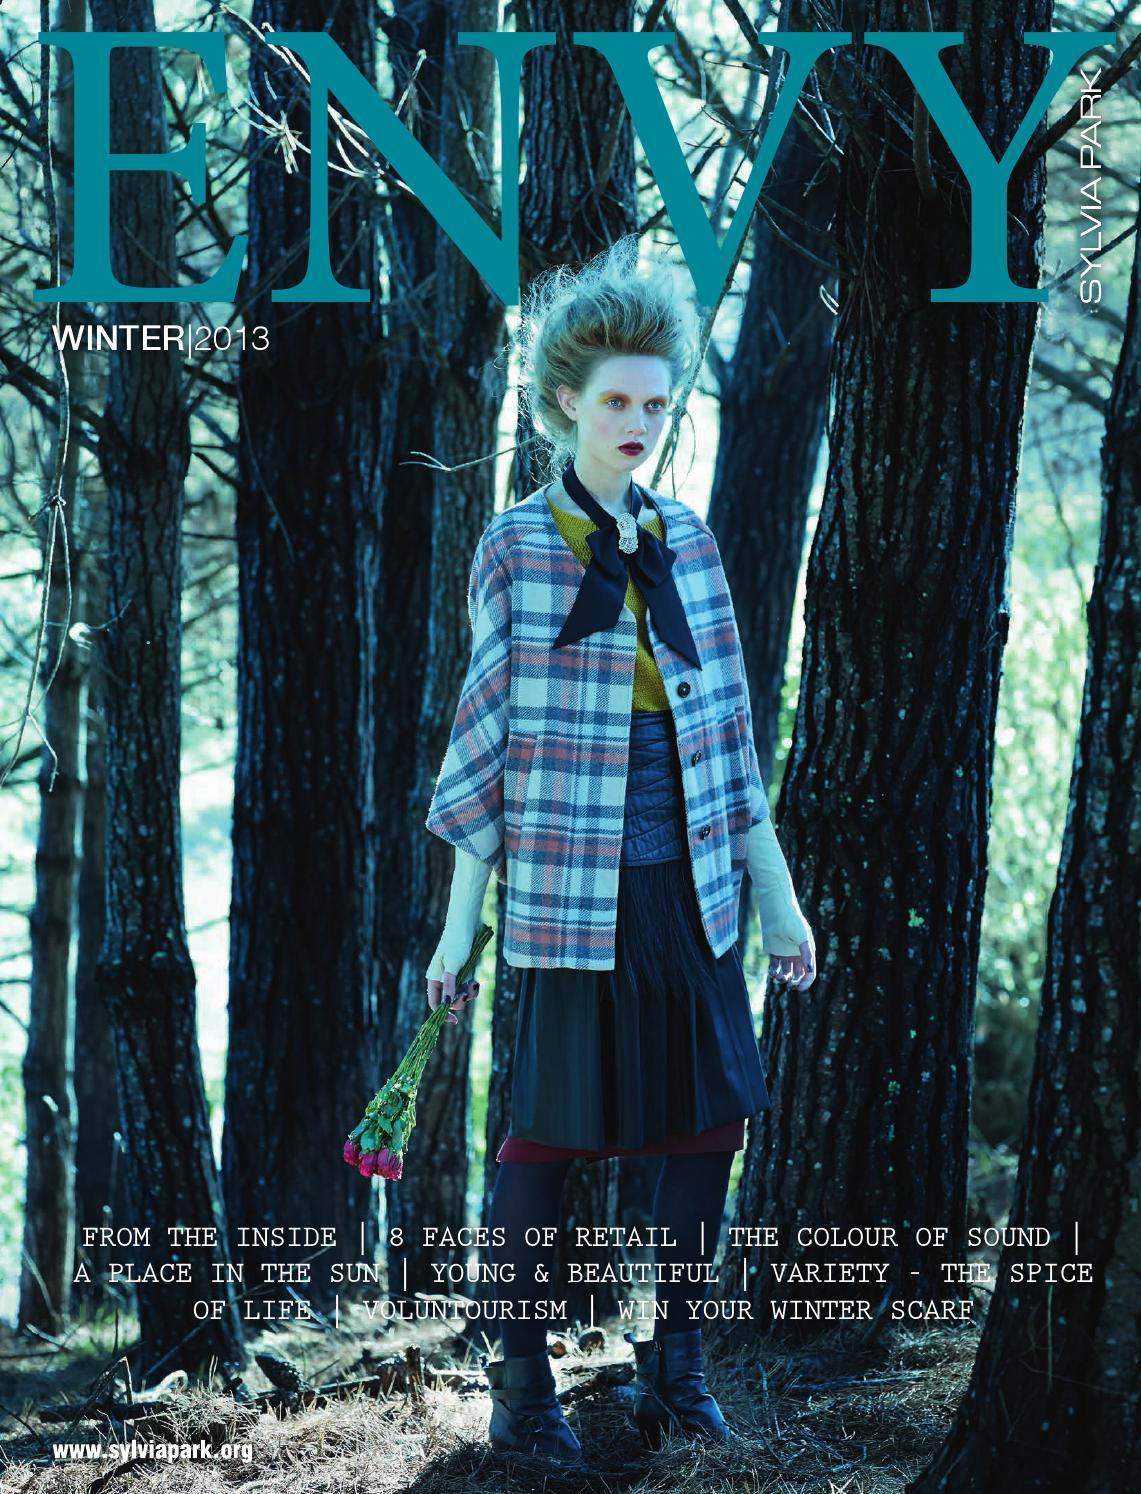 envy sylvia park winter magazine 2013 by innuendo advertising